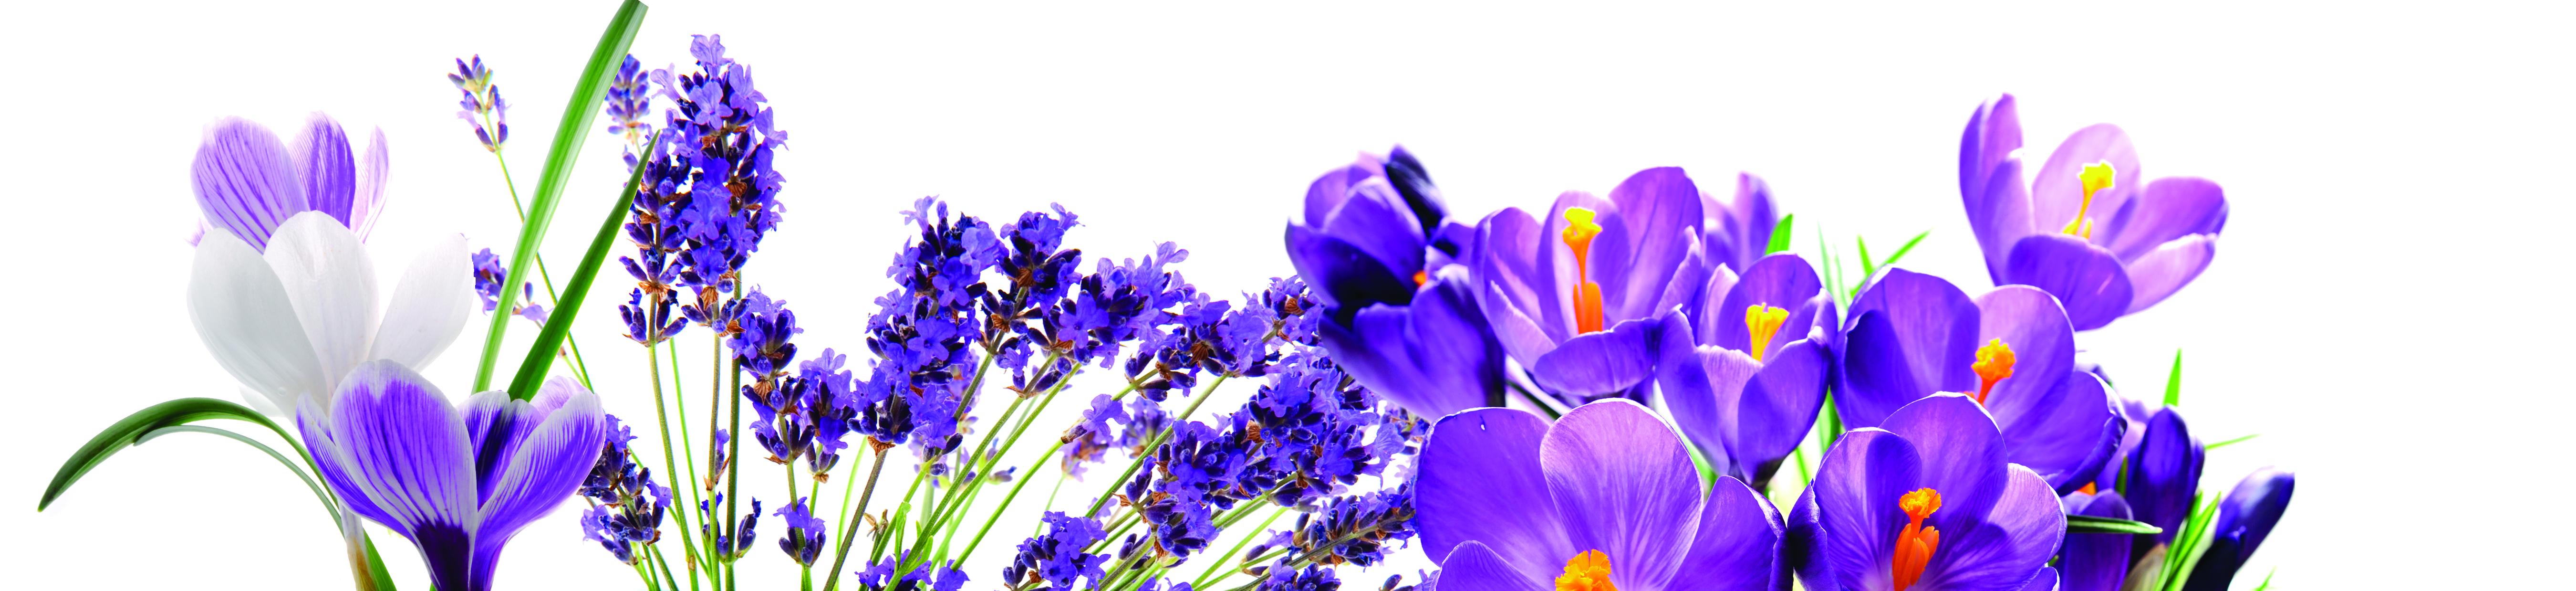 catalogue_bande_fleursmauves